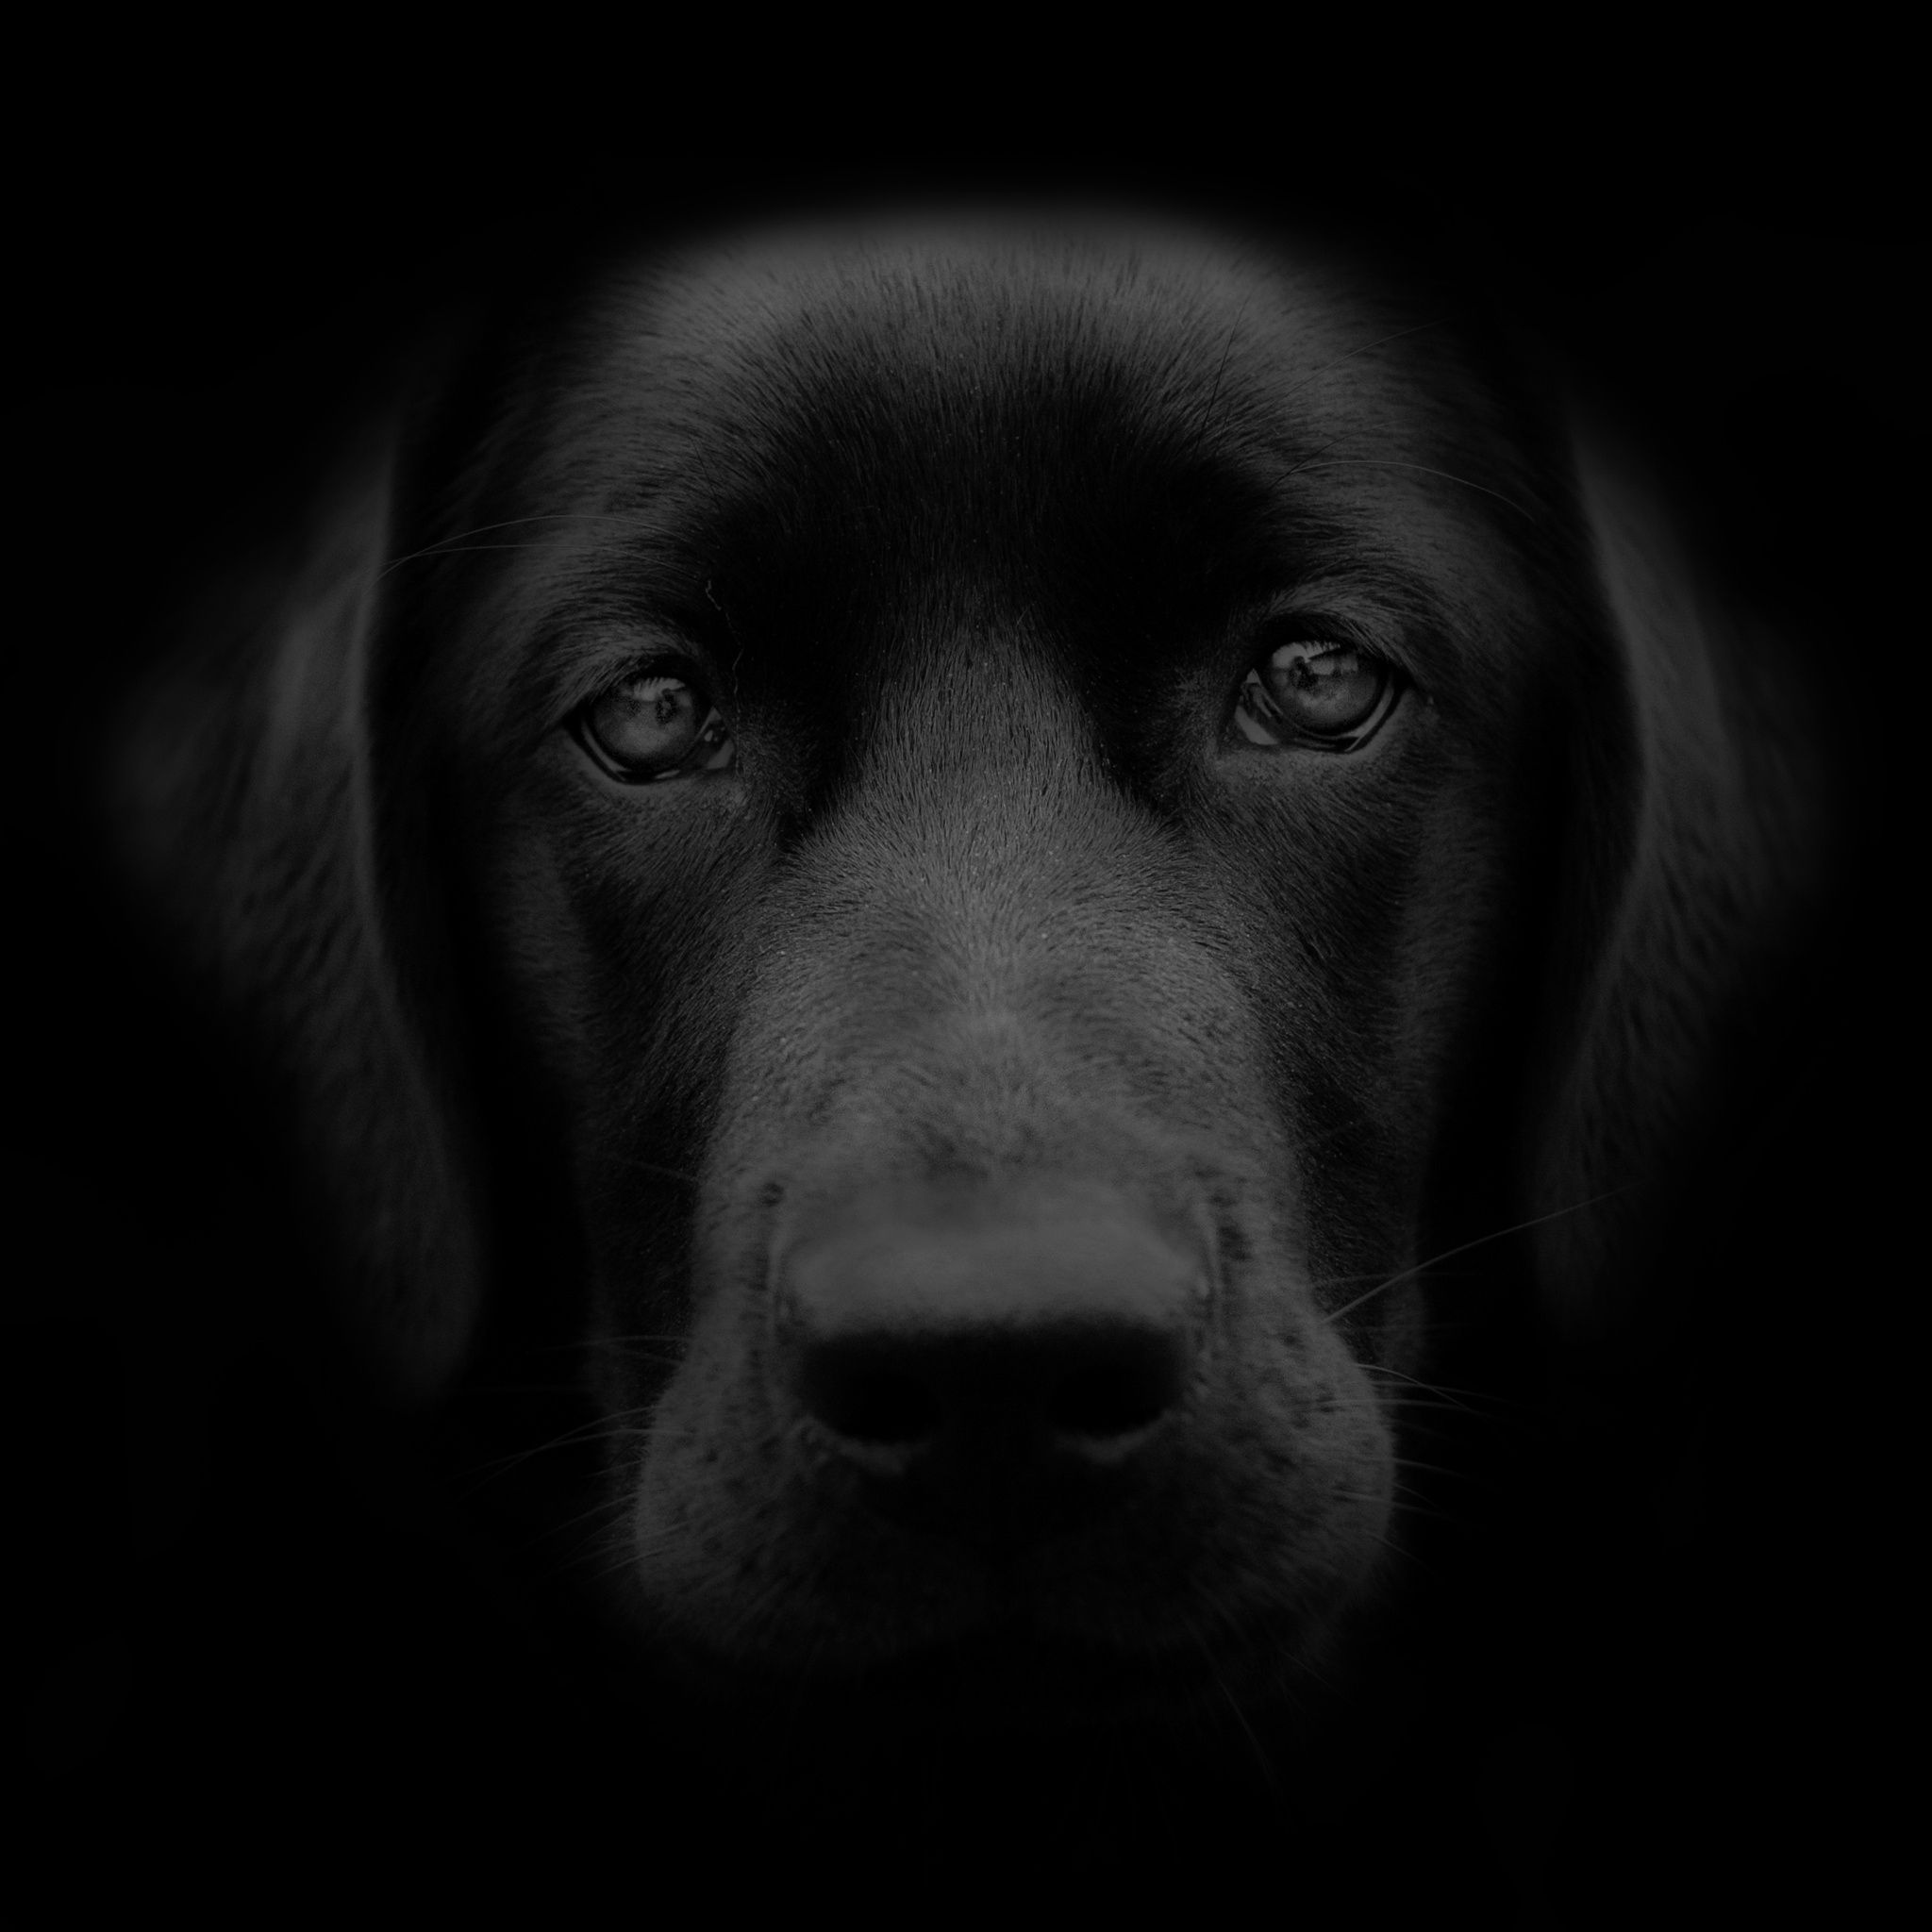 Dog portrait by Tom Egil Dørum on 500px